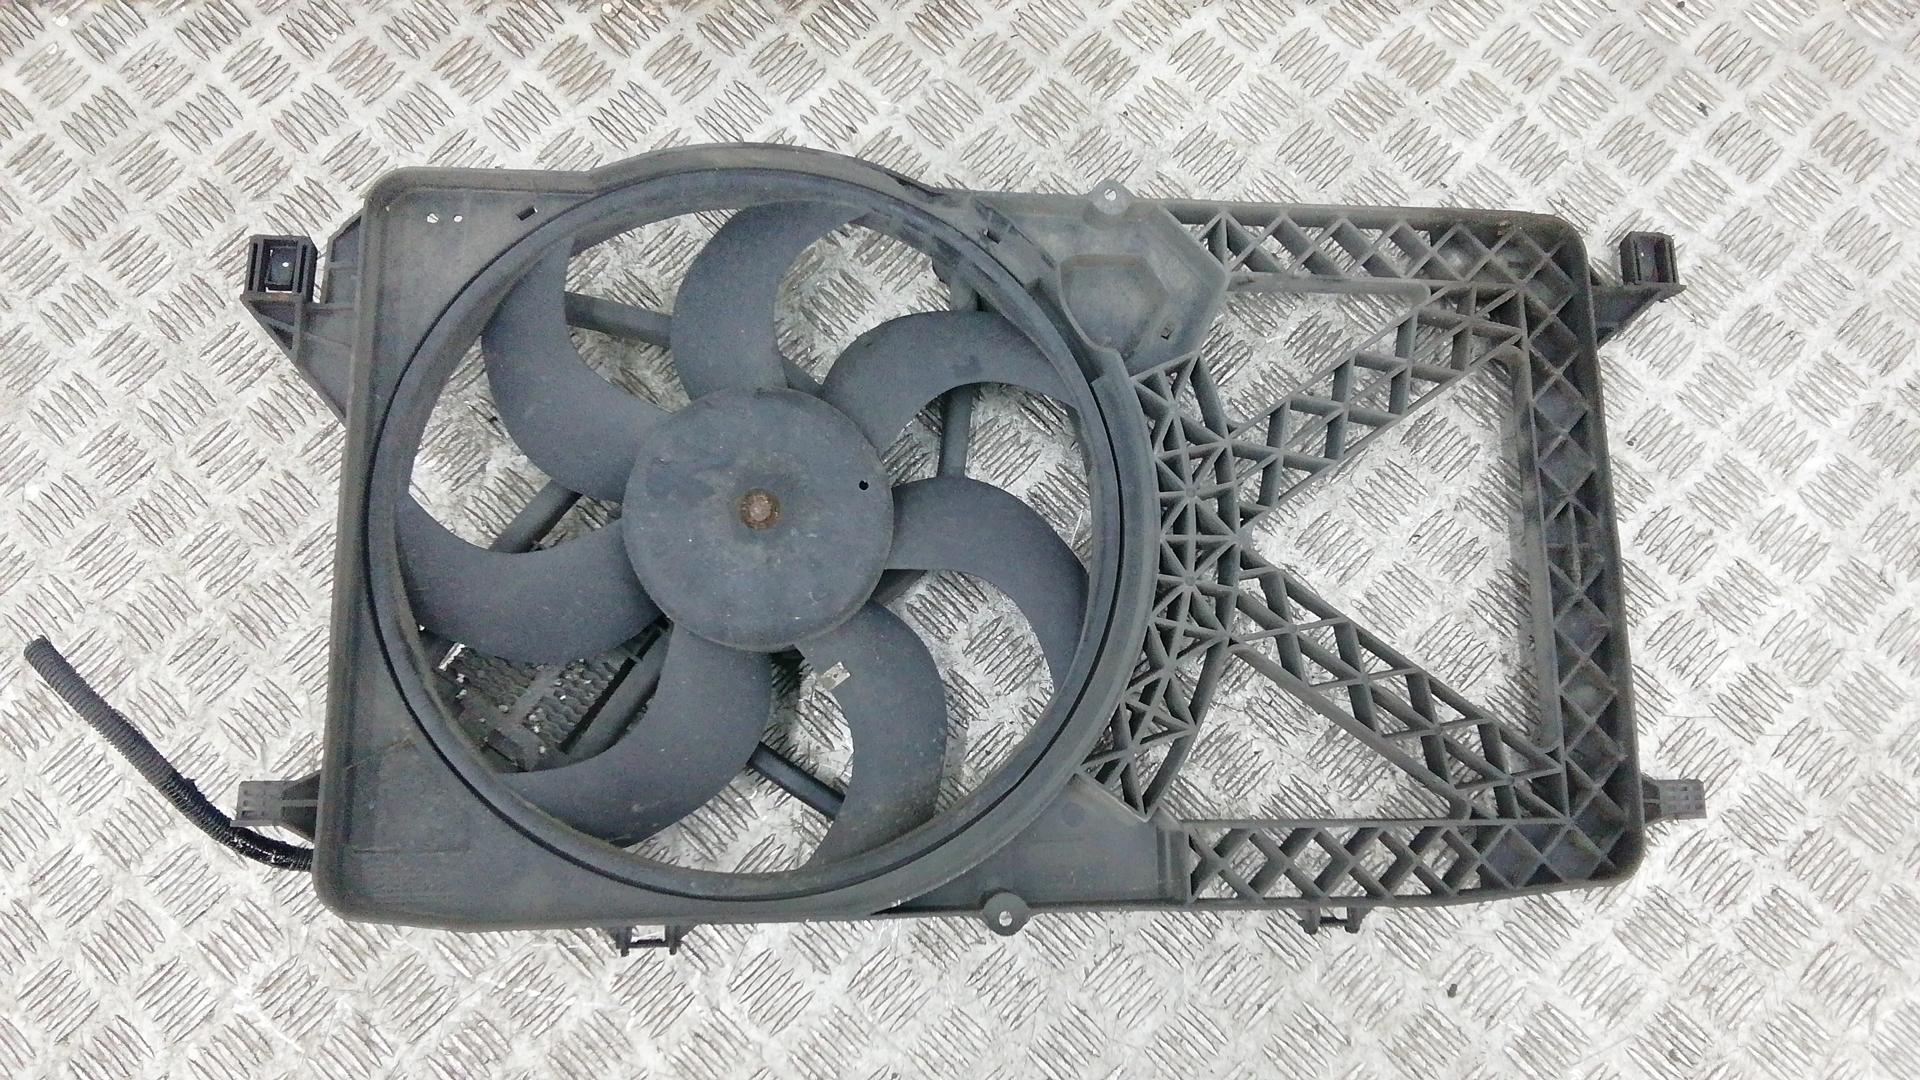 Вентилятор радиатора, FORD, TRANSIT 7, 2009